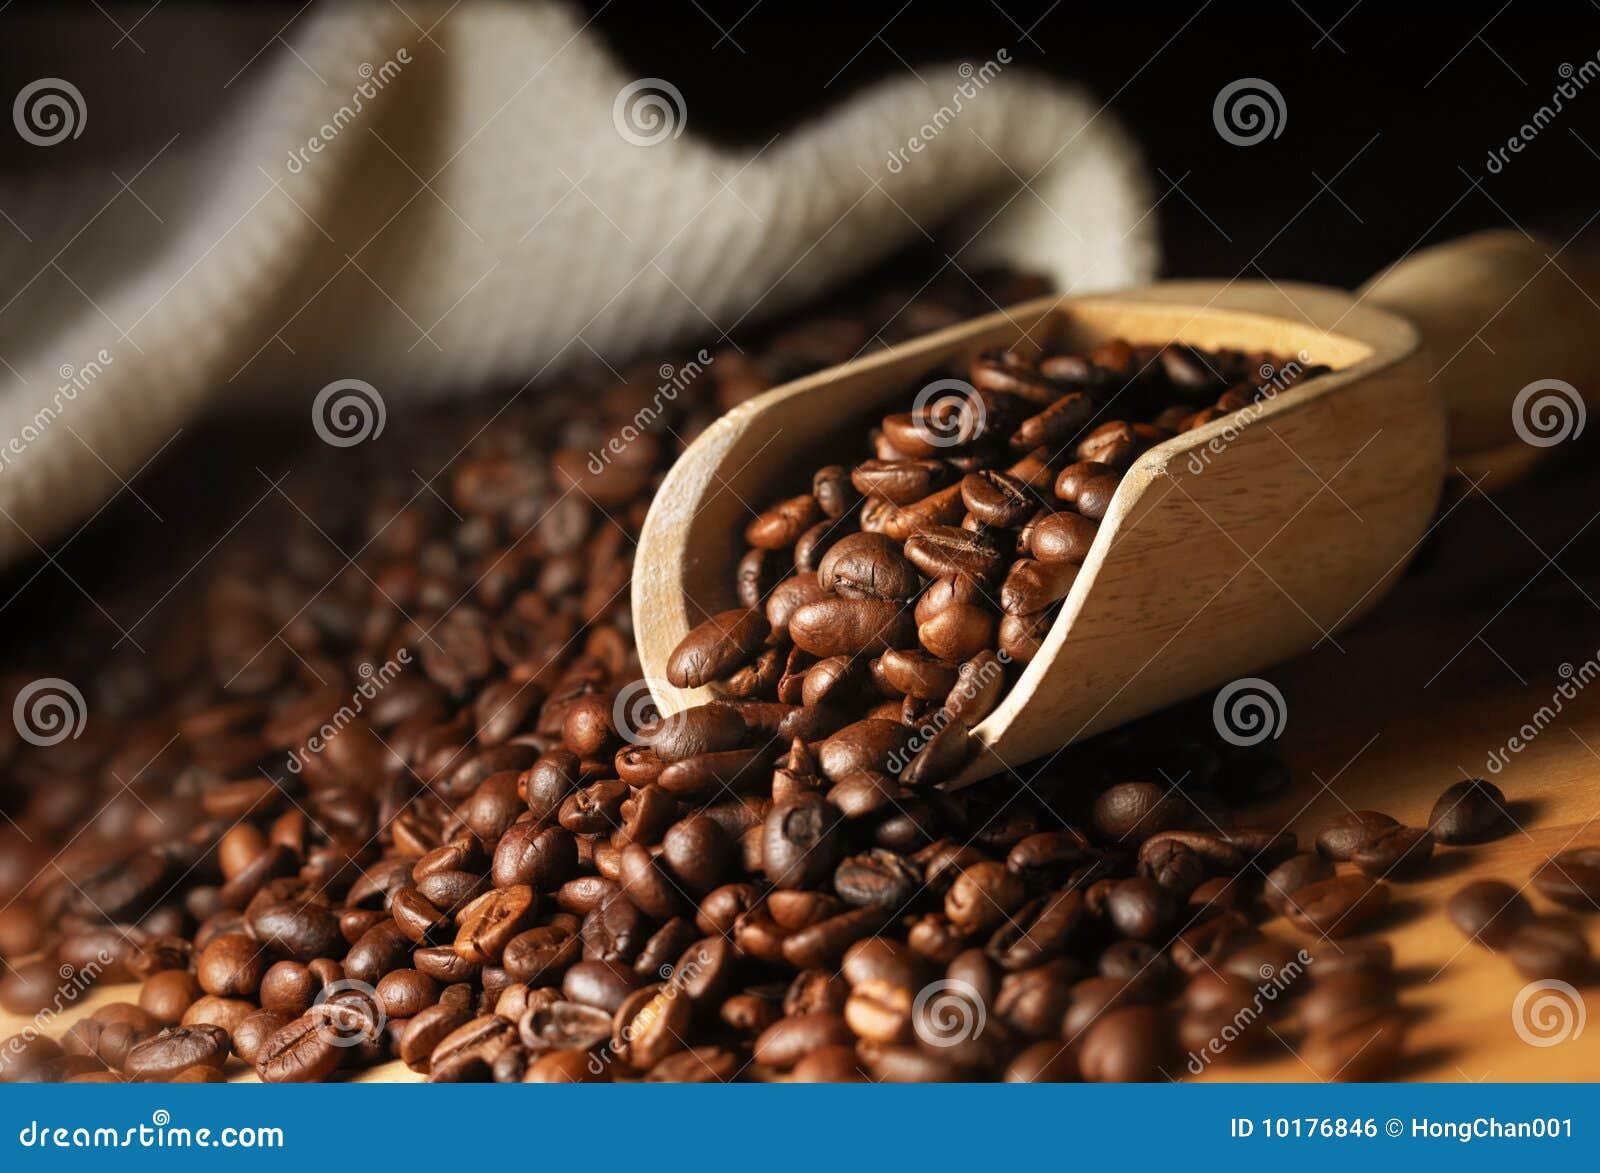 Coffee Bean Royalty Free Stock Image Image 10176846